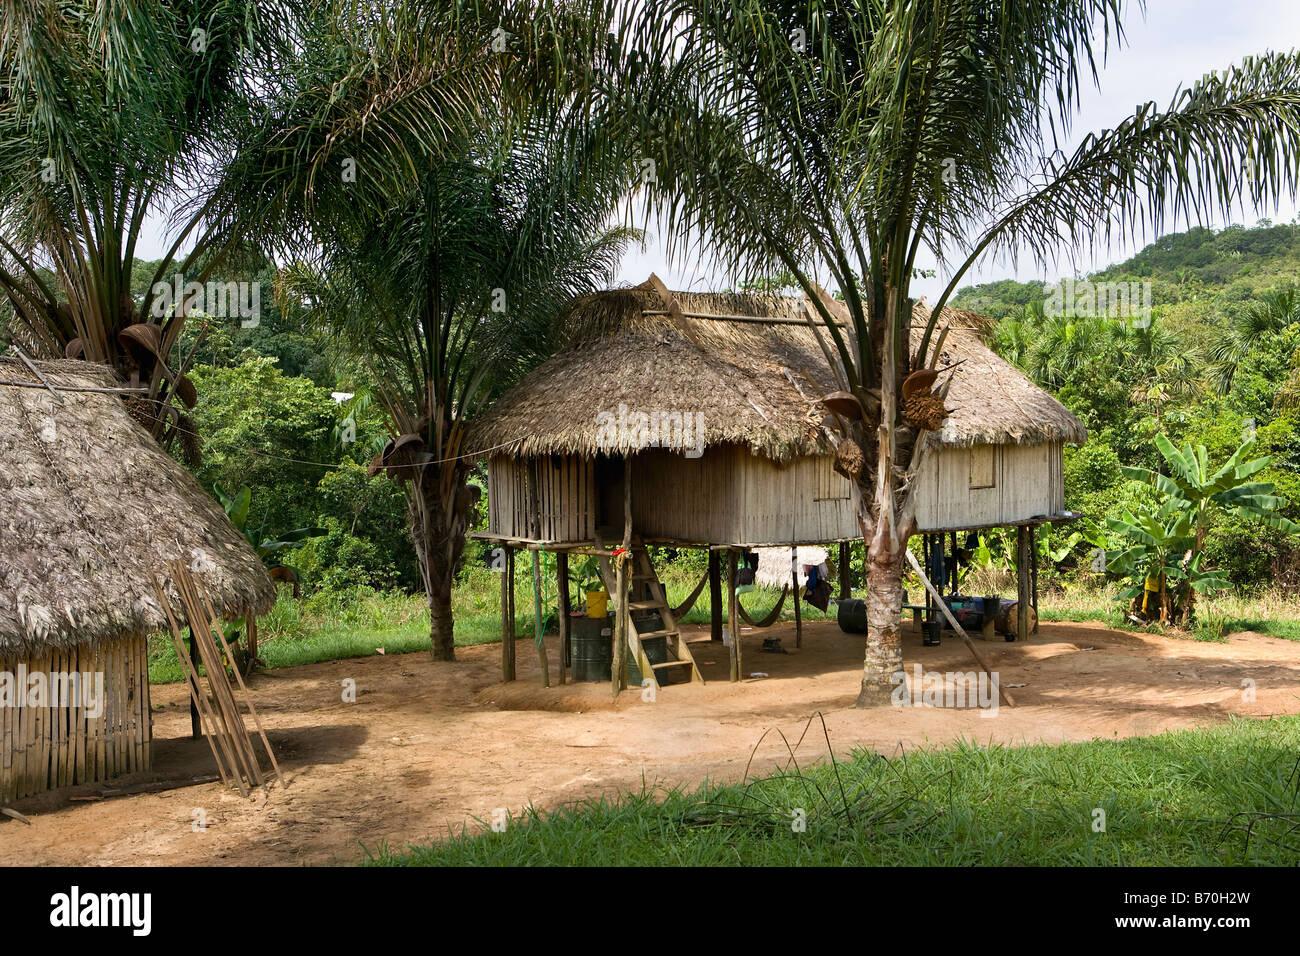 Suriname, Kwamalasamutu, hogar de los indígenas. Antena. Cabañas sobre pilotes. Imagen De Stock